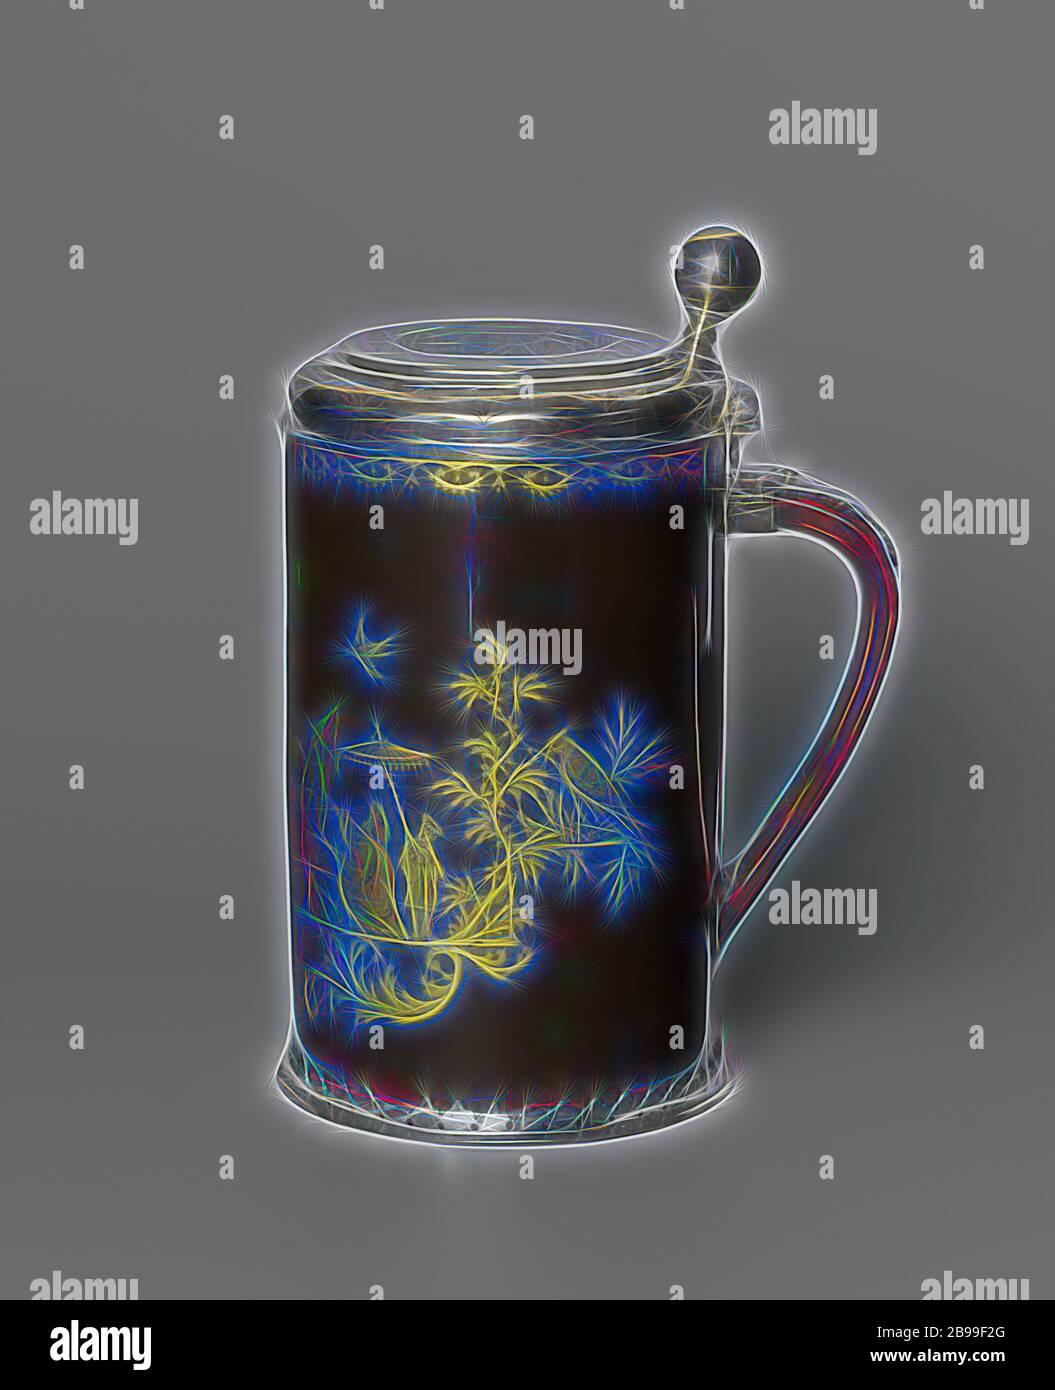 Cylindrical Beer Mug High Resolution Stock Photography And Images Alamy